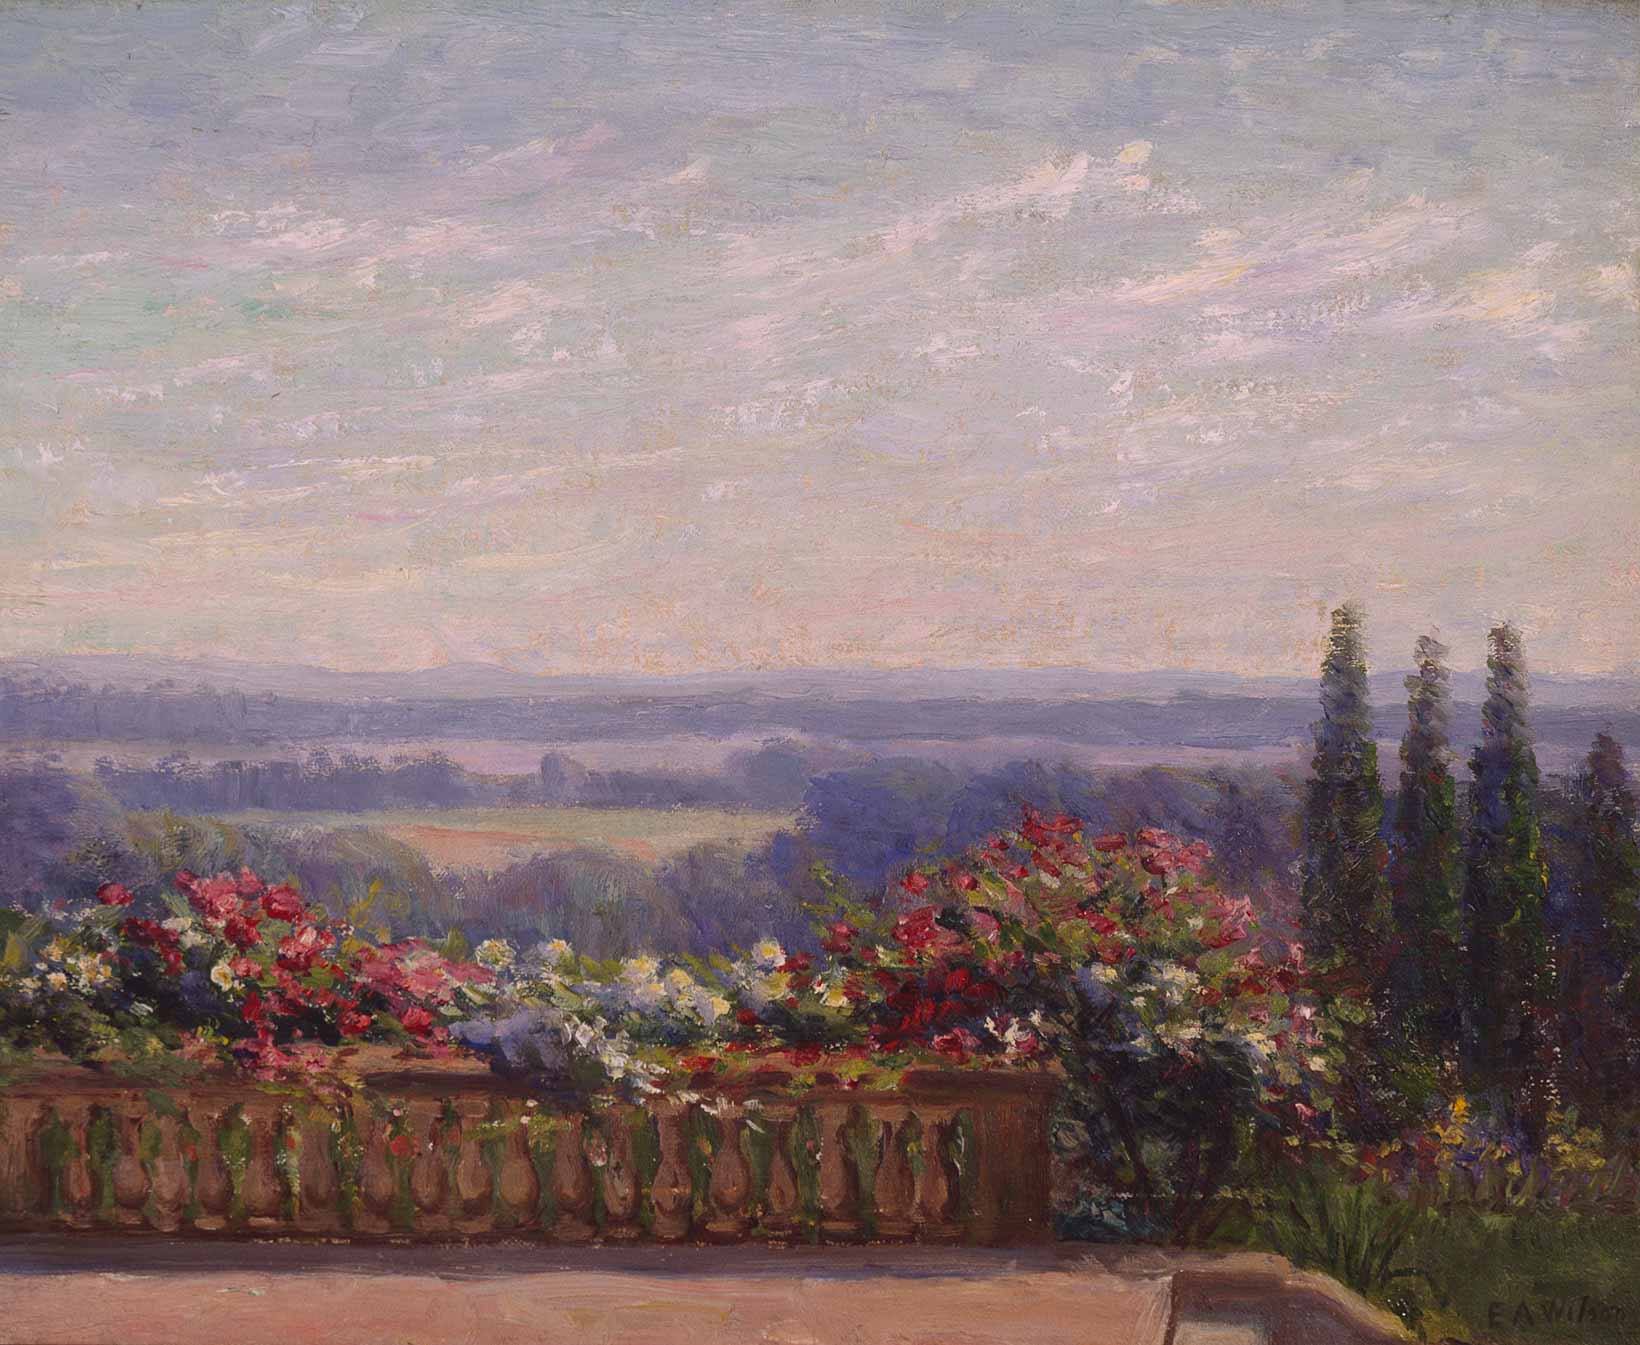 artwork of former first lady ellen axson wilson in old lyme ct ellen axson wilson 1860 1914 the terrace 1902 1910 oil on canvas 16 x 13